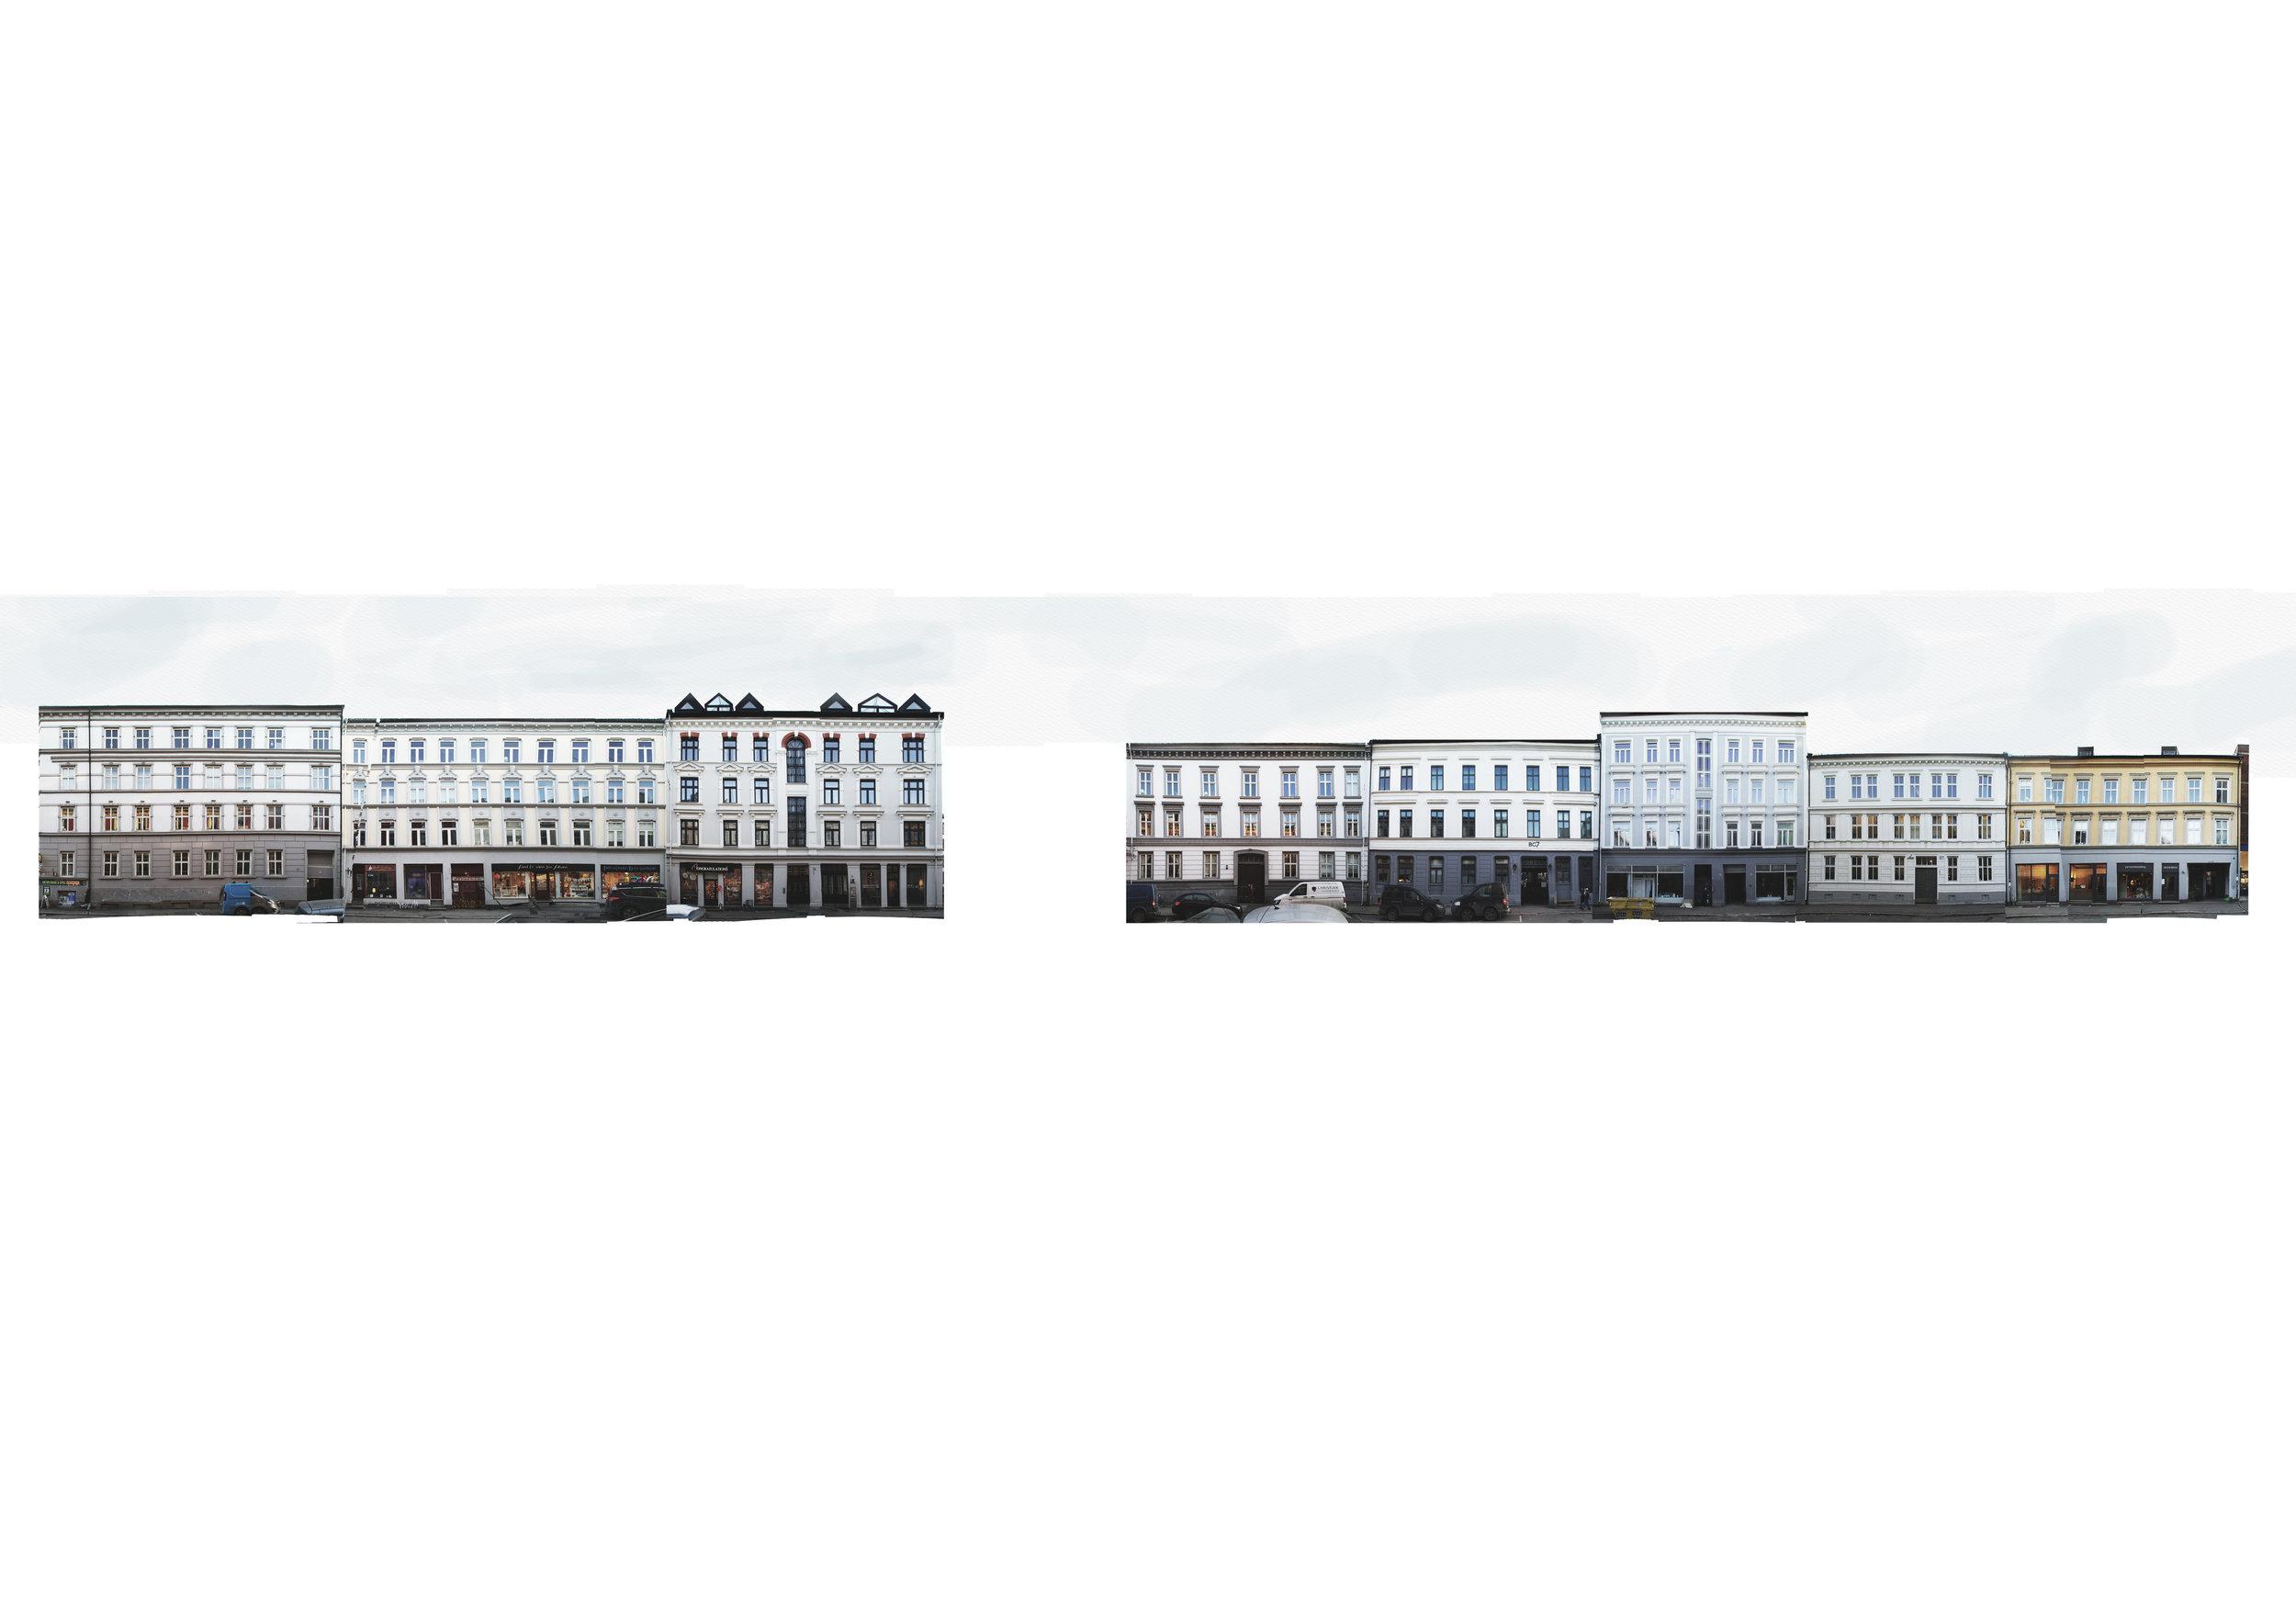 Fasaderekke.jpg